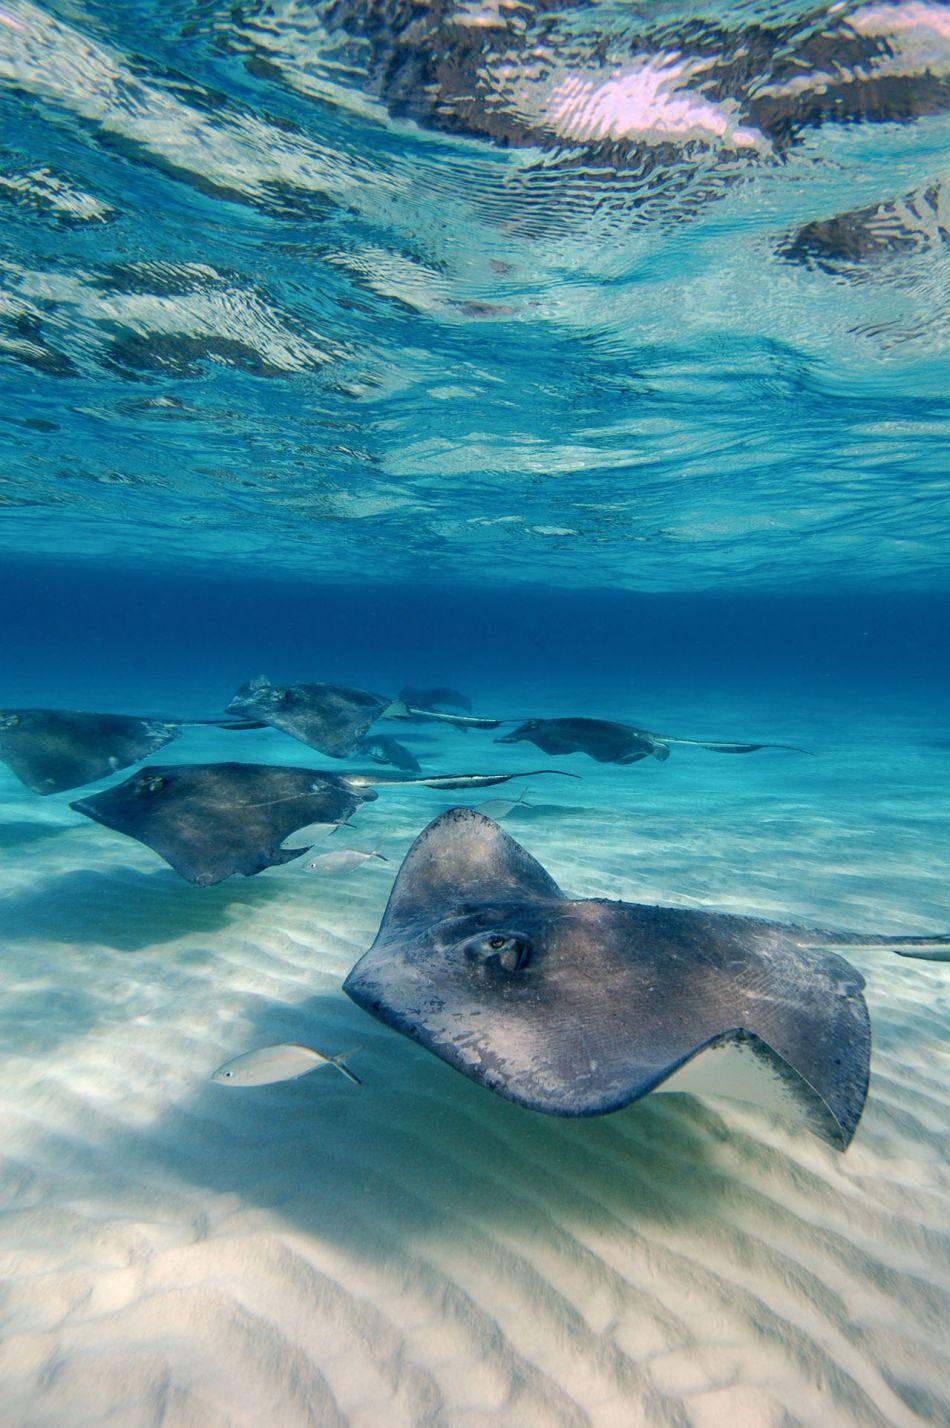 Stingray Snorkel Trips to the Sandbar in Grand Cayman - Image 25